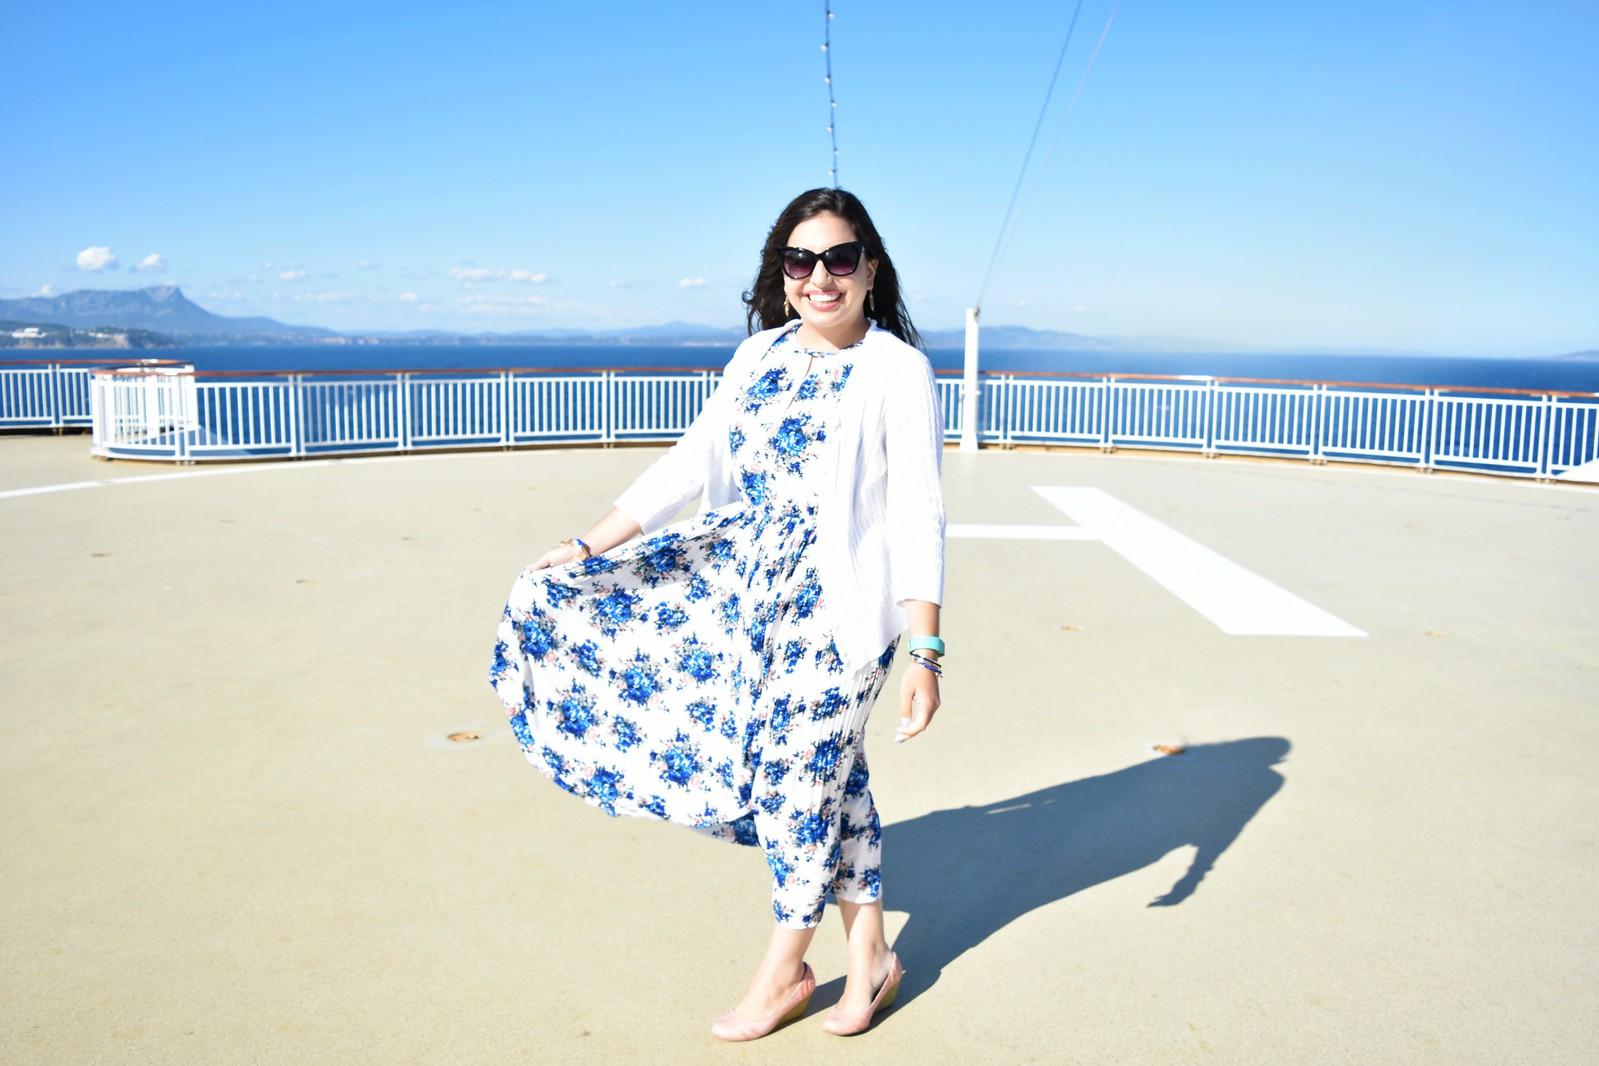 Maison Jules Sleeveless Printed Midi Dress // france mediterranean cruise outfit